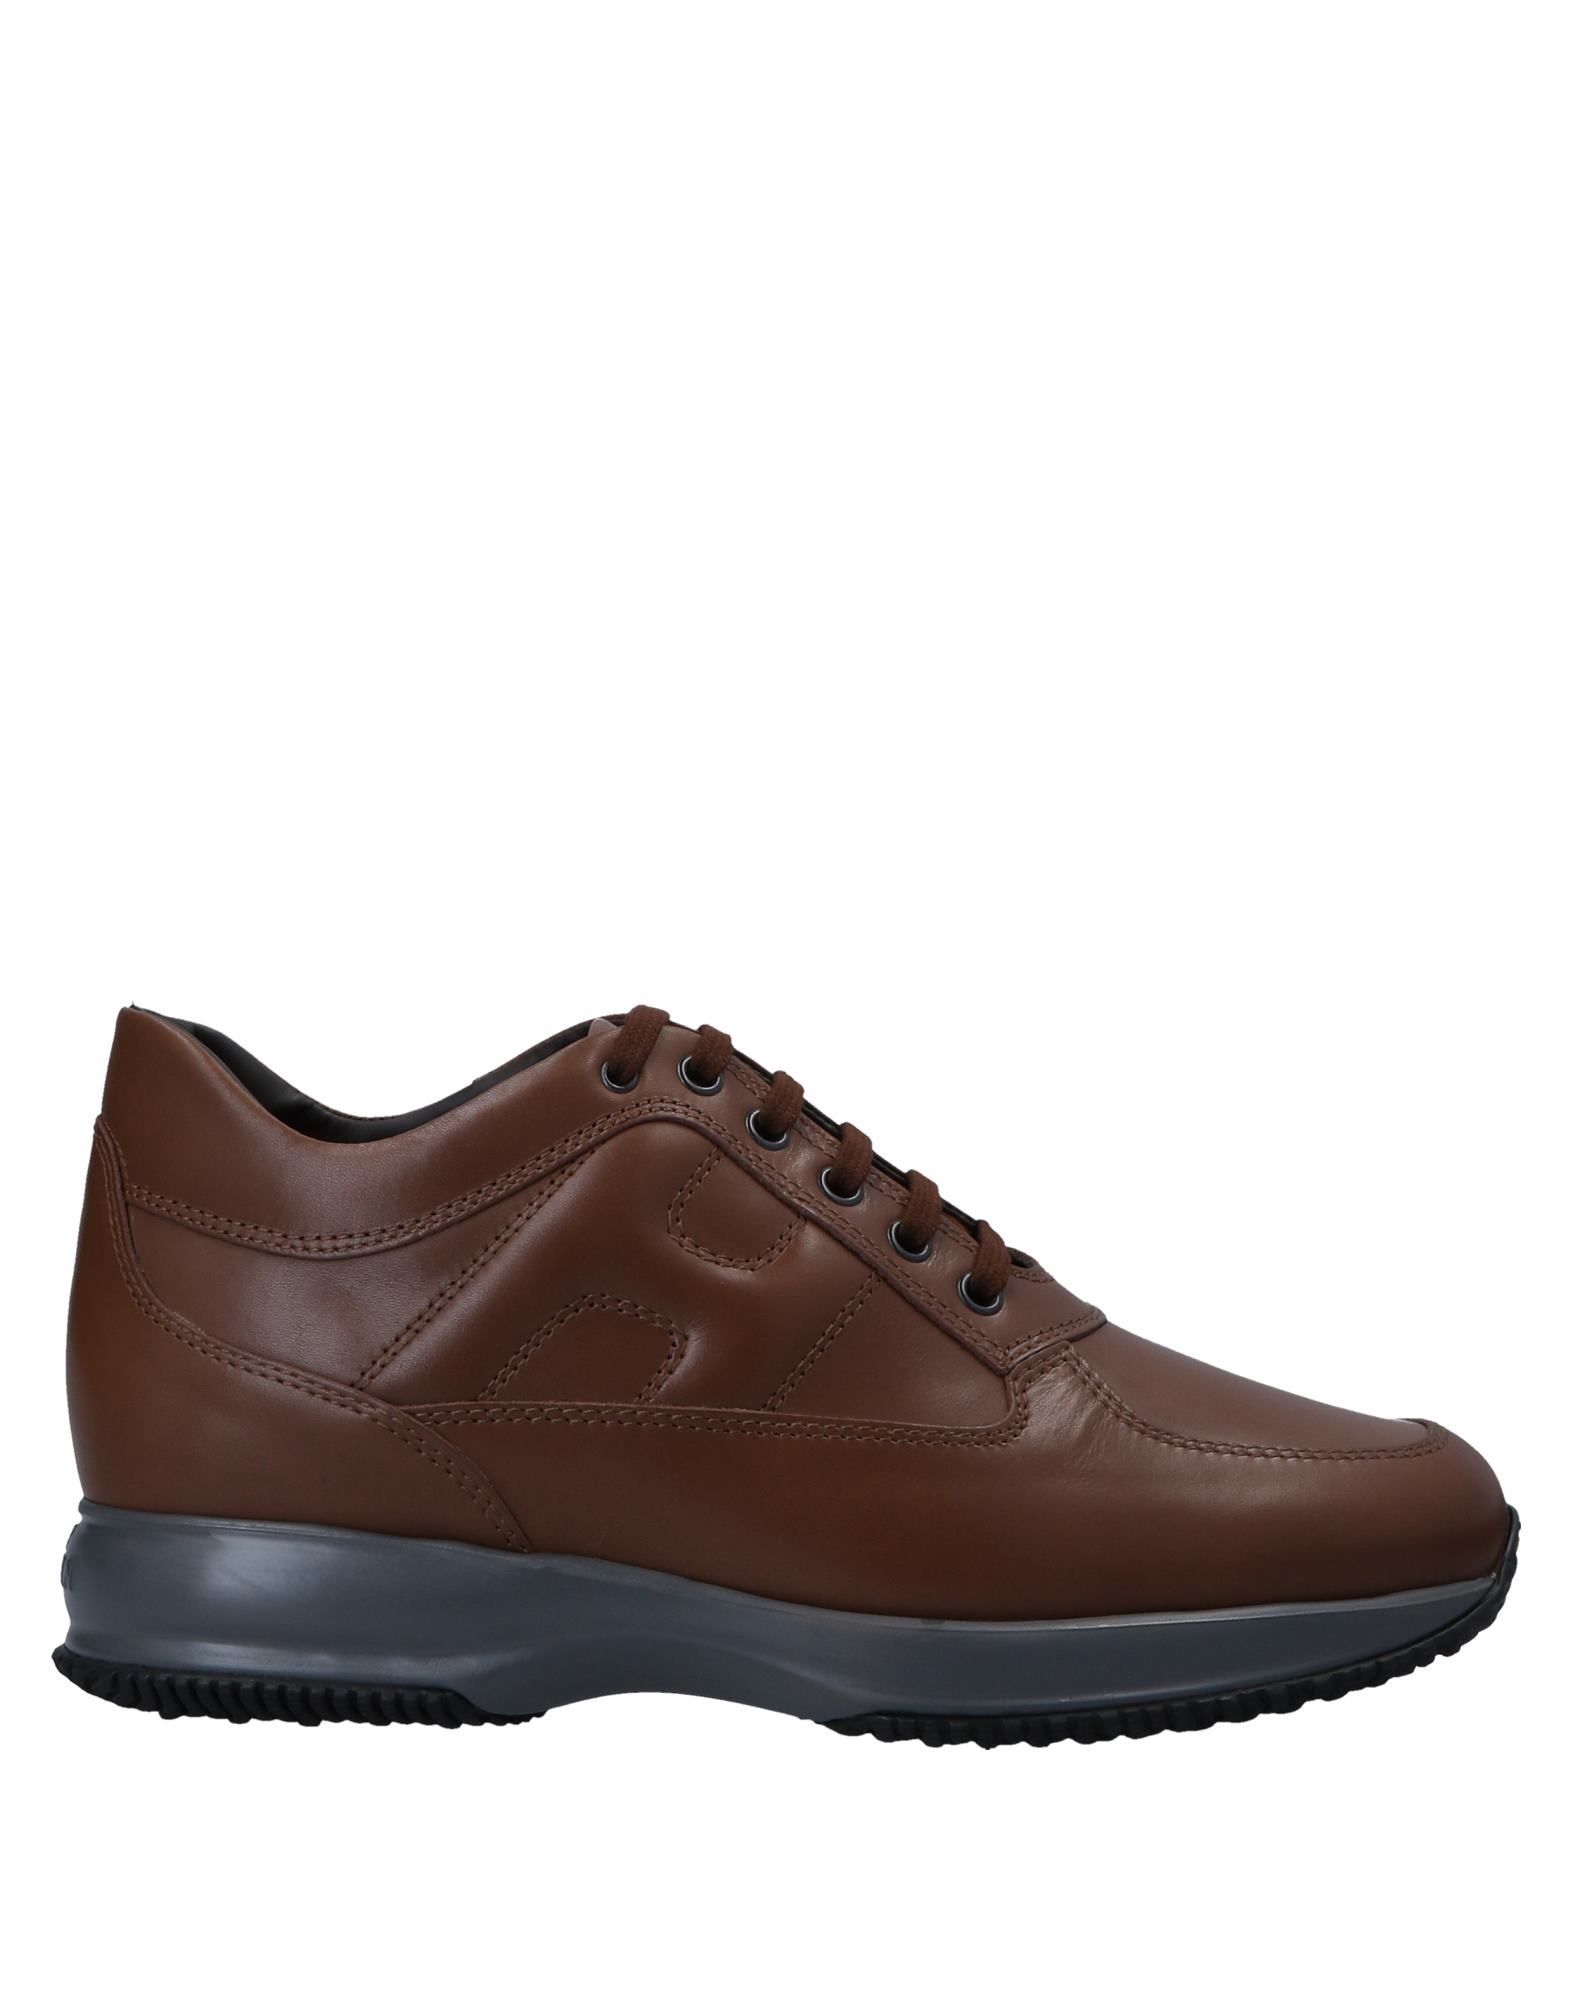 Hogan Sneakers Herren  11559571LU Gute Qualität beliebte Schuhe